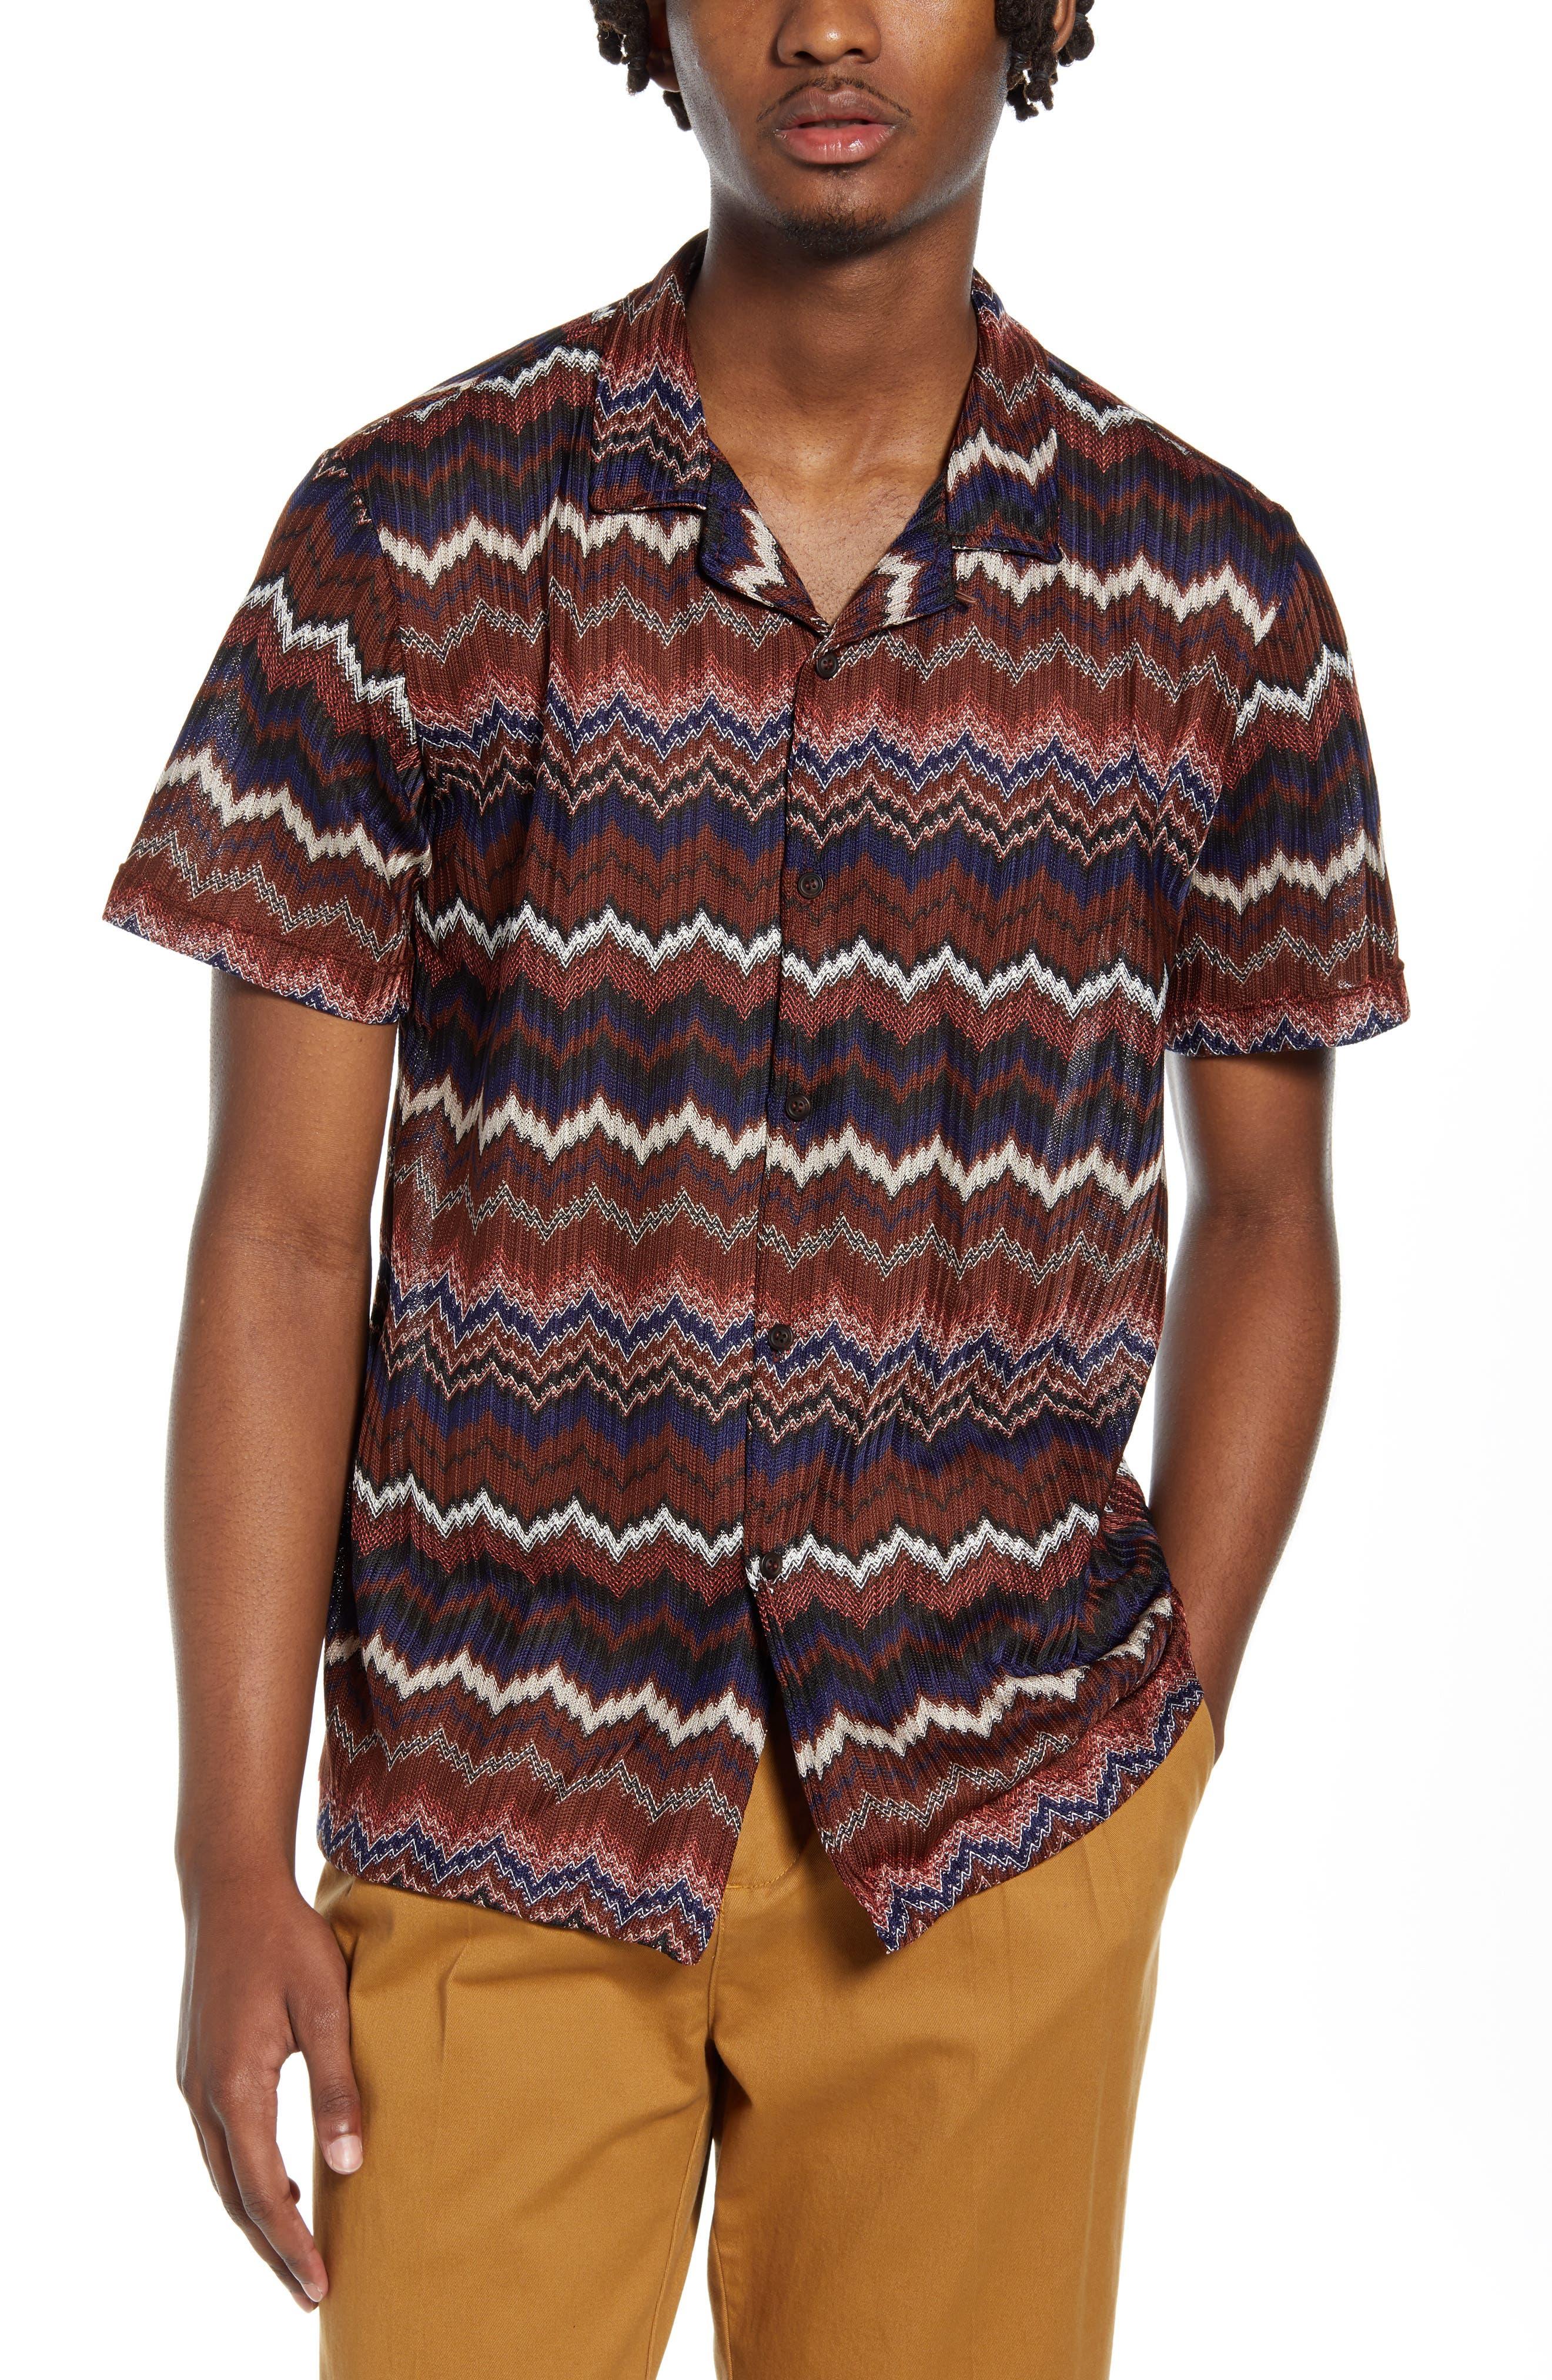 1960s – 70s Mens Shirts- Disco Shirts, Hippie Shirts Mens Topman Chevron Short Sleeve Button-Up Knit Camp Shirt Size Small - Brown $70.00 AT vintagedancer.com